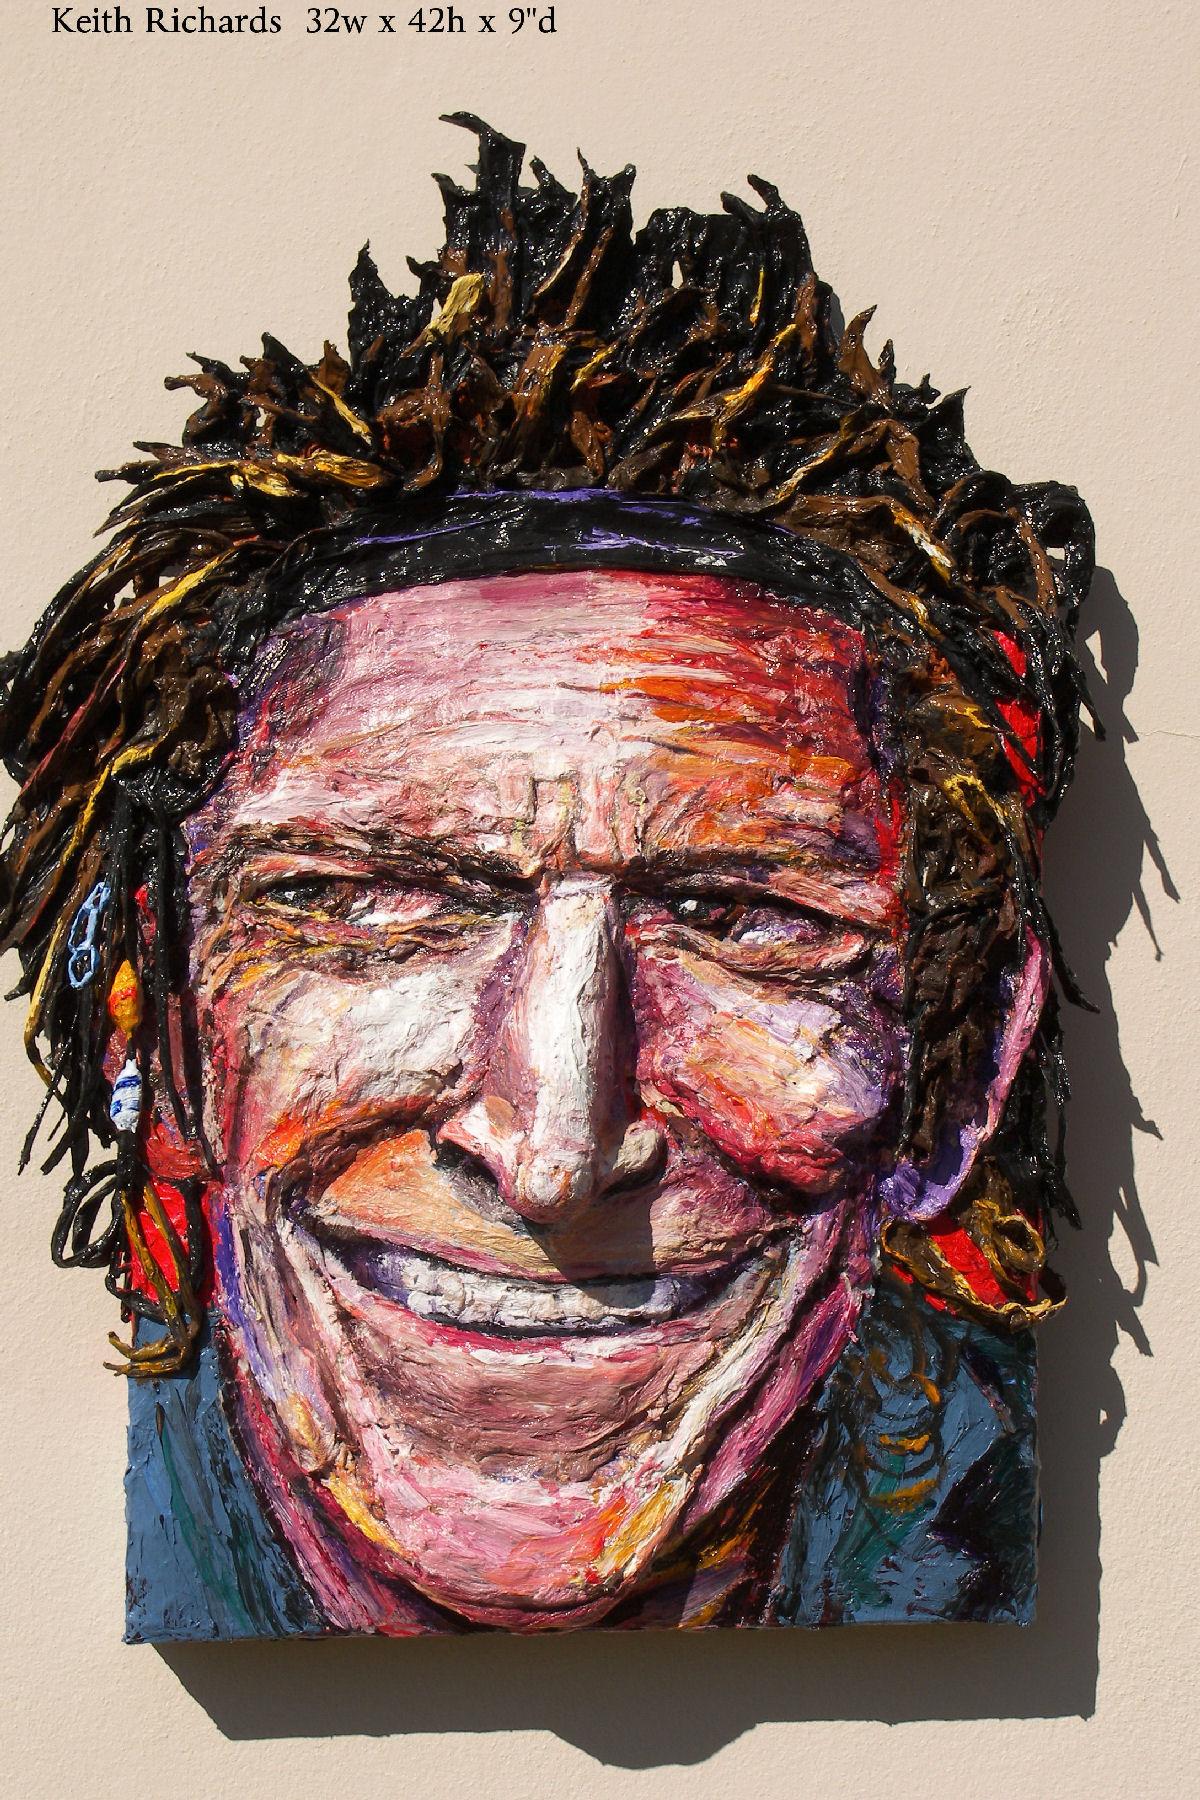 Built-Out Portrait of Keith Richards by Artist Brett Stuart Wilson